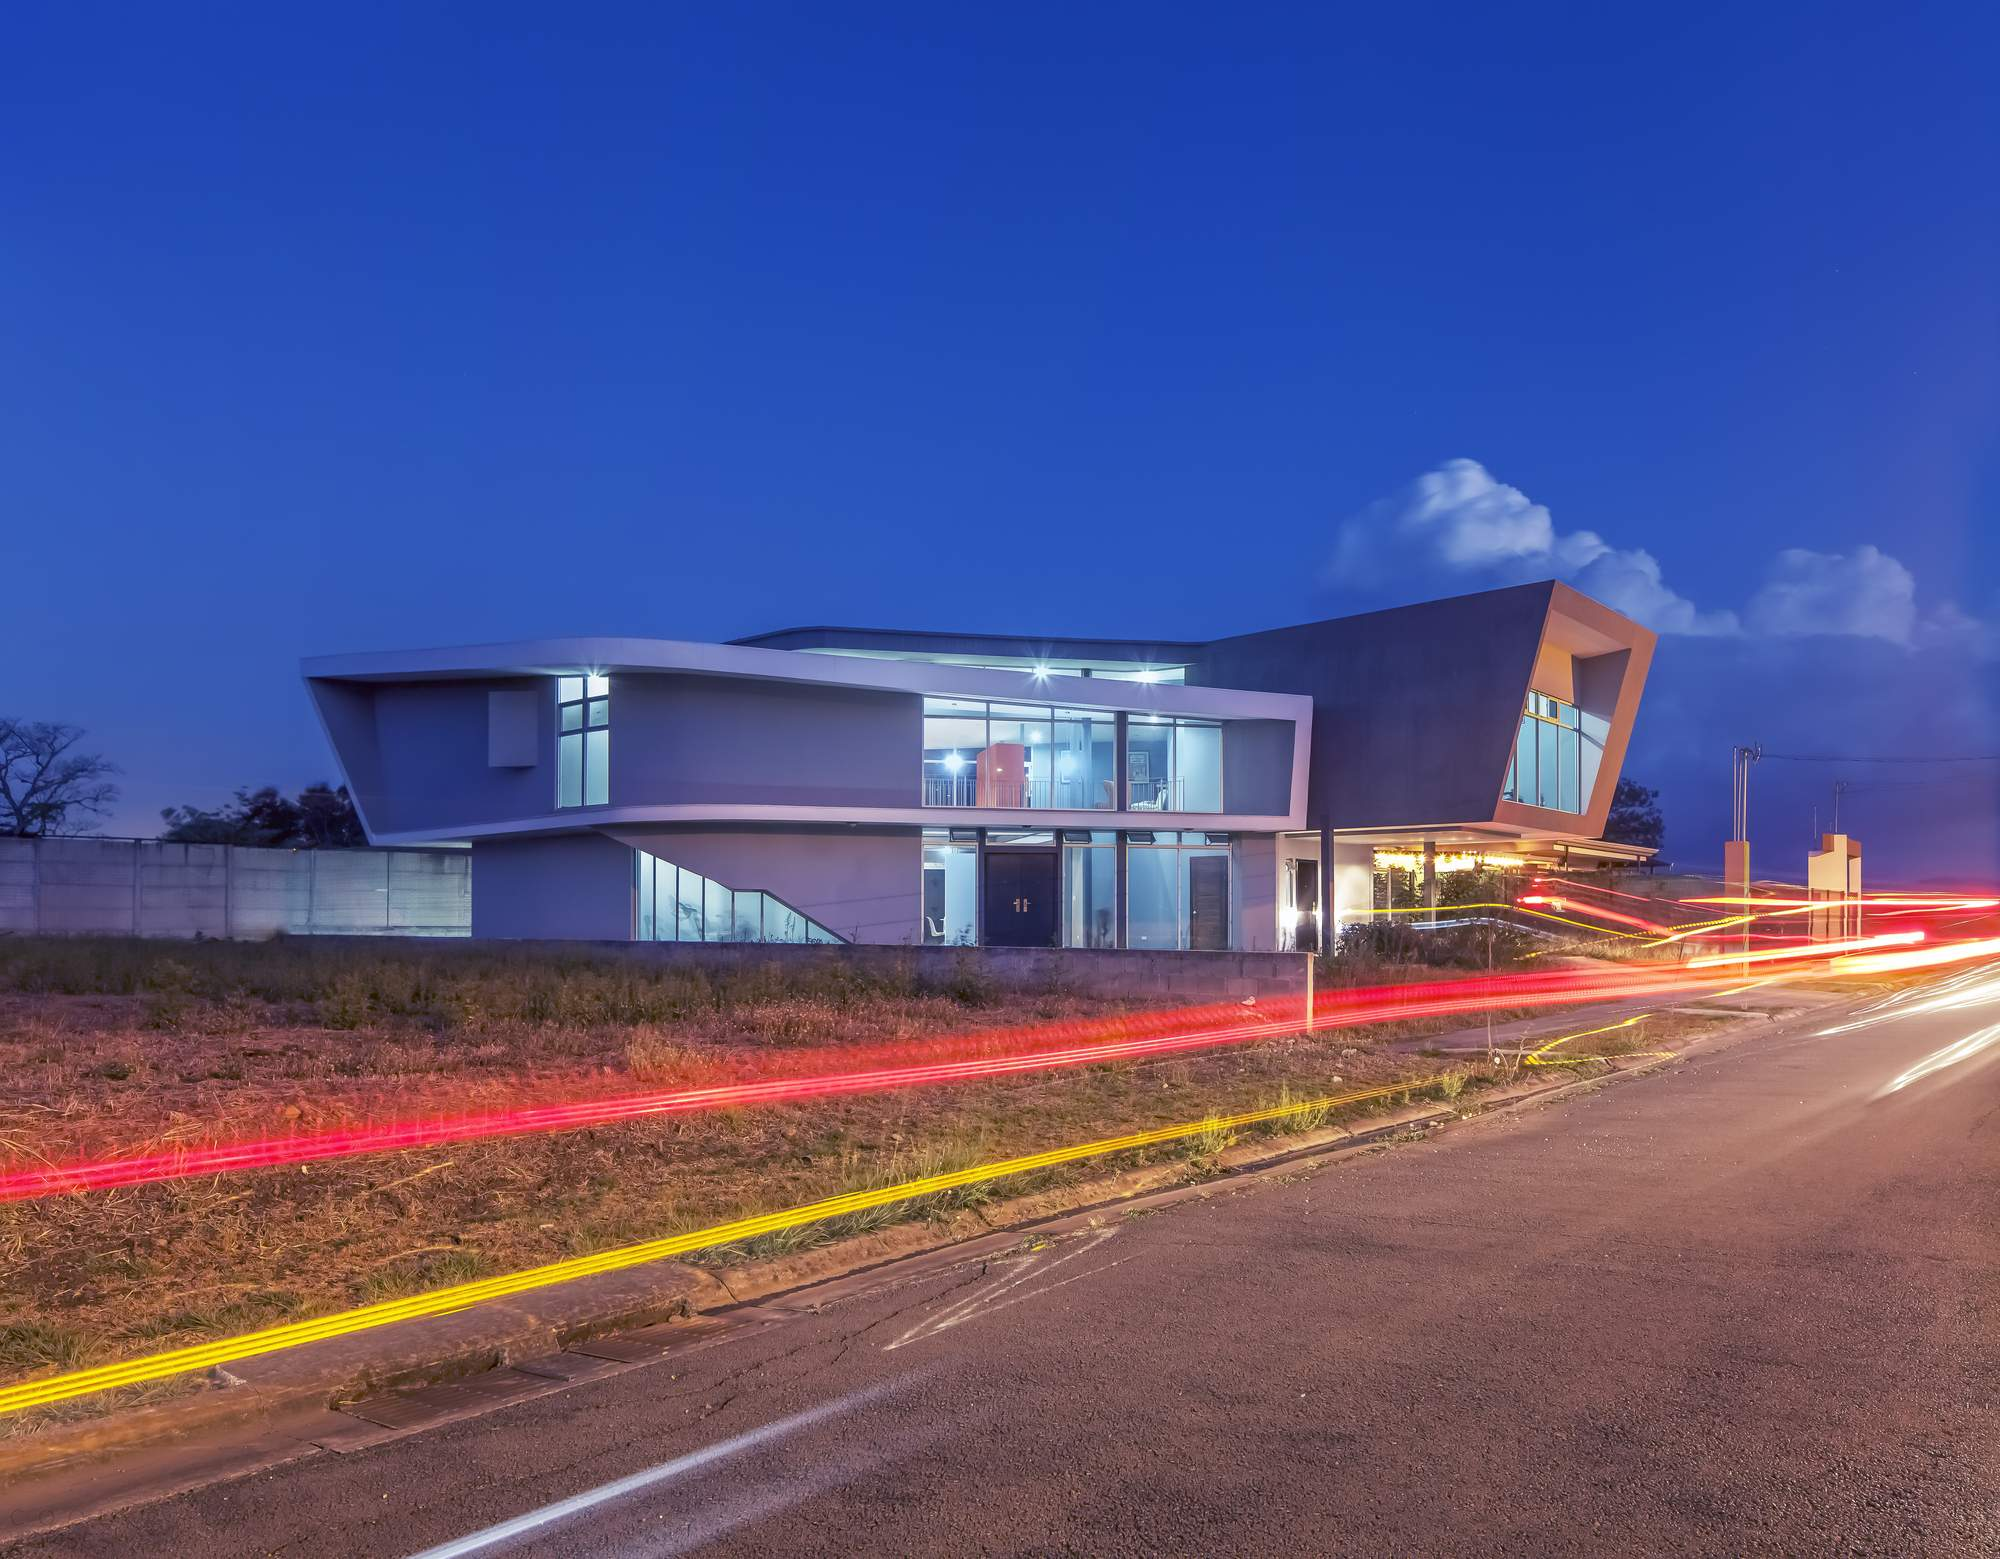 Особняк с ярким дизайном в Коста-Рика